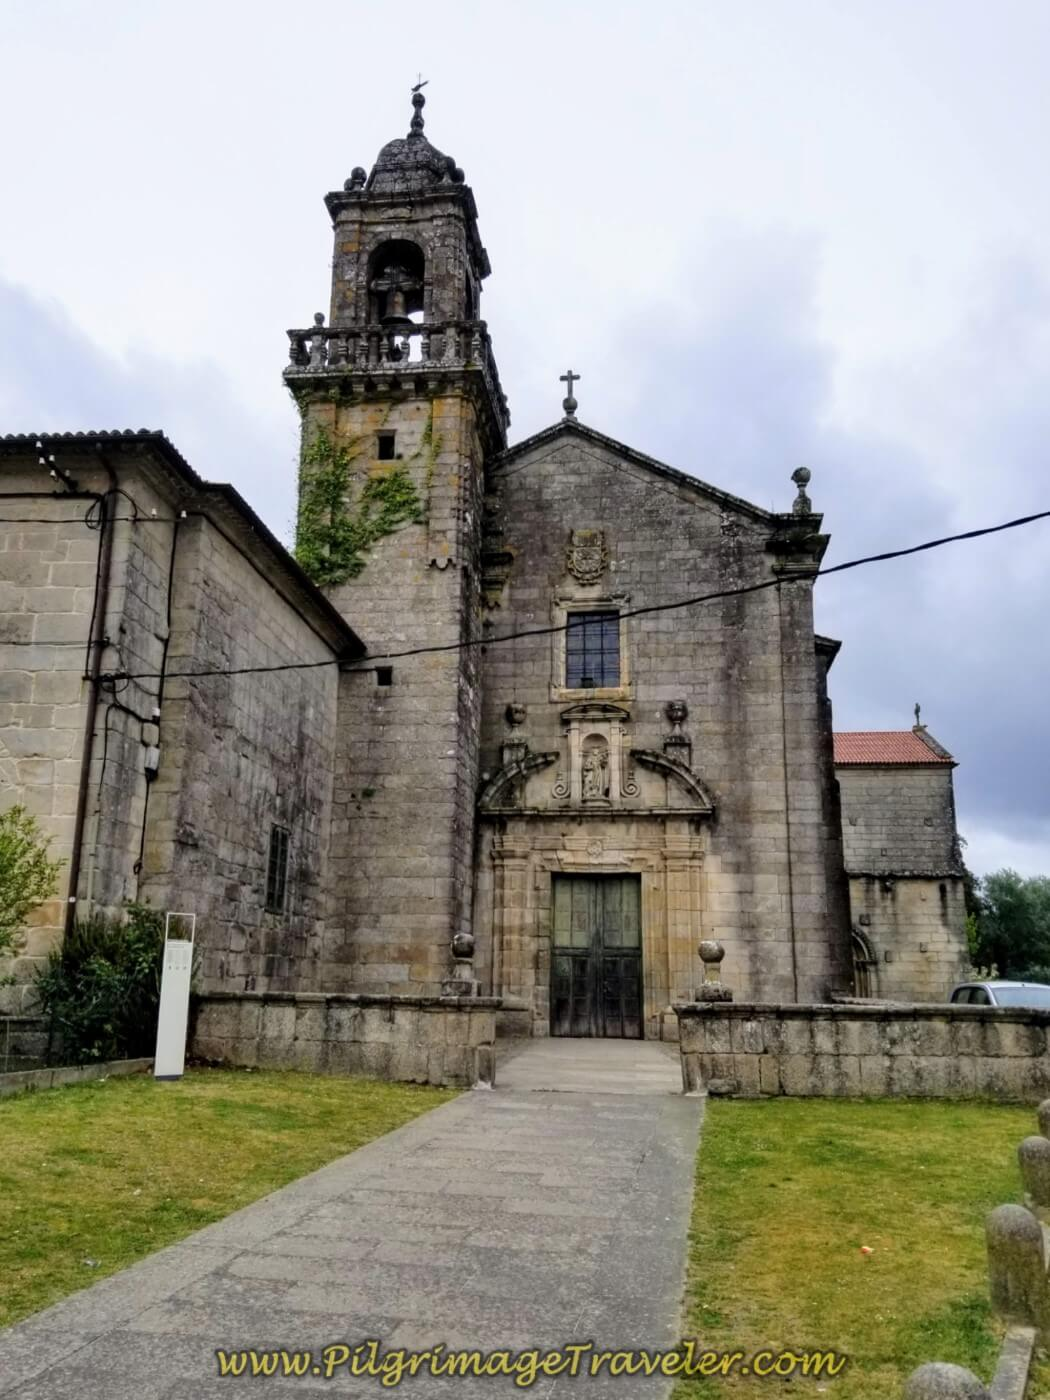 Walking by the Igrexa de Santo do Domingo in Tui on day twenty on the central route of the Portuguese Camino